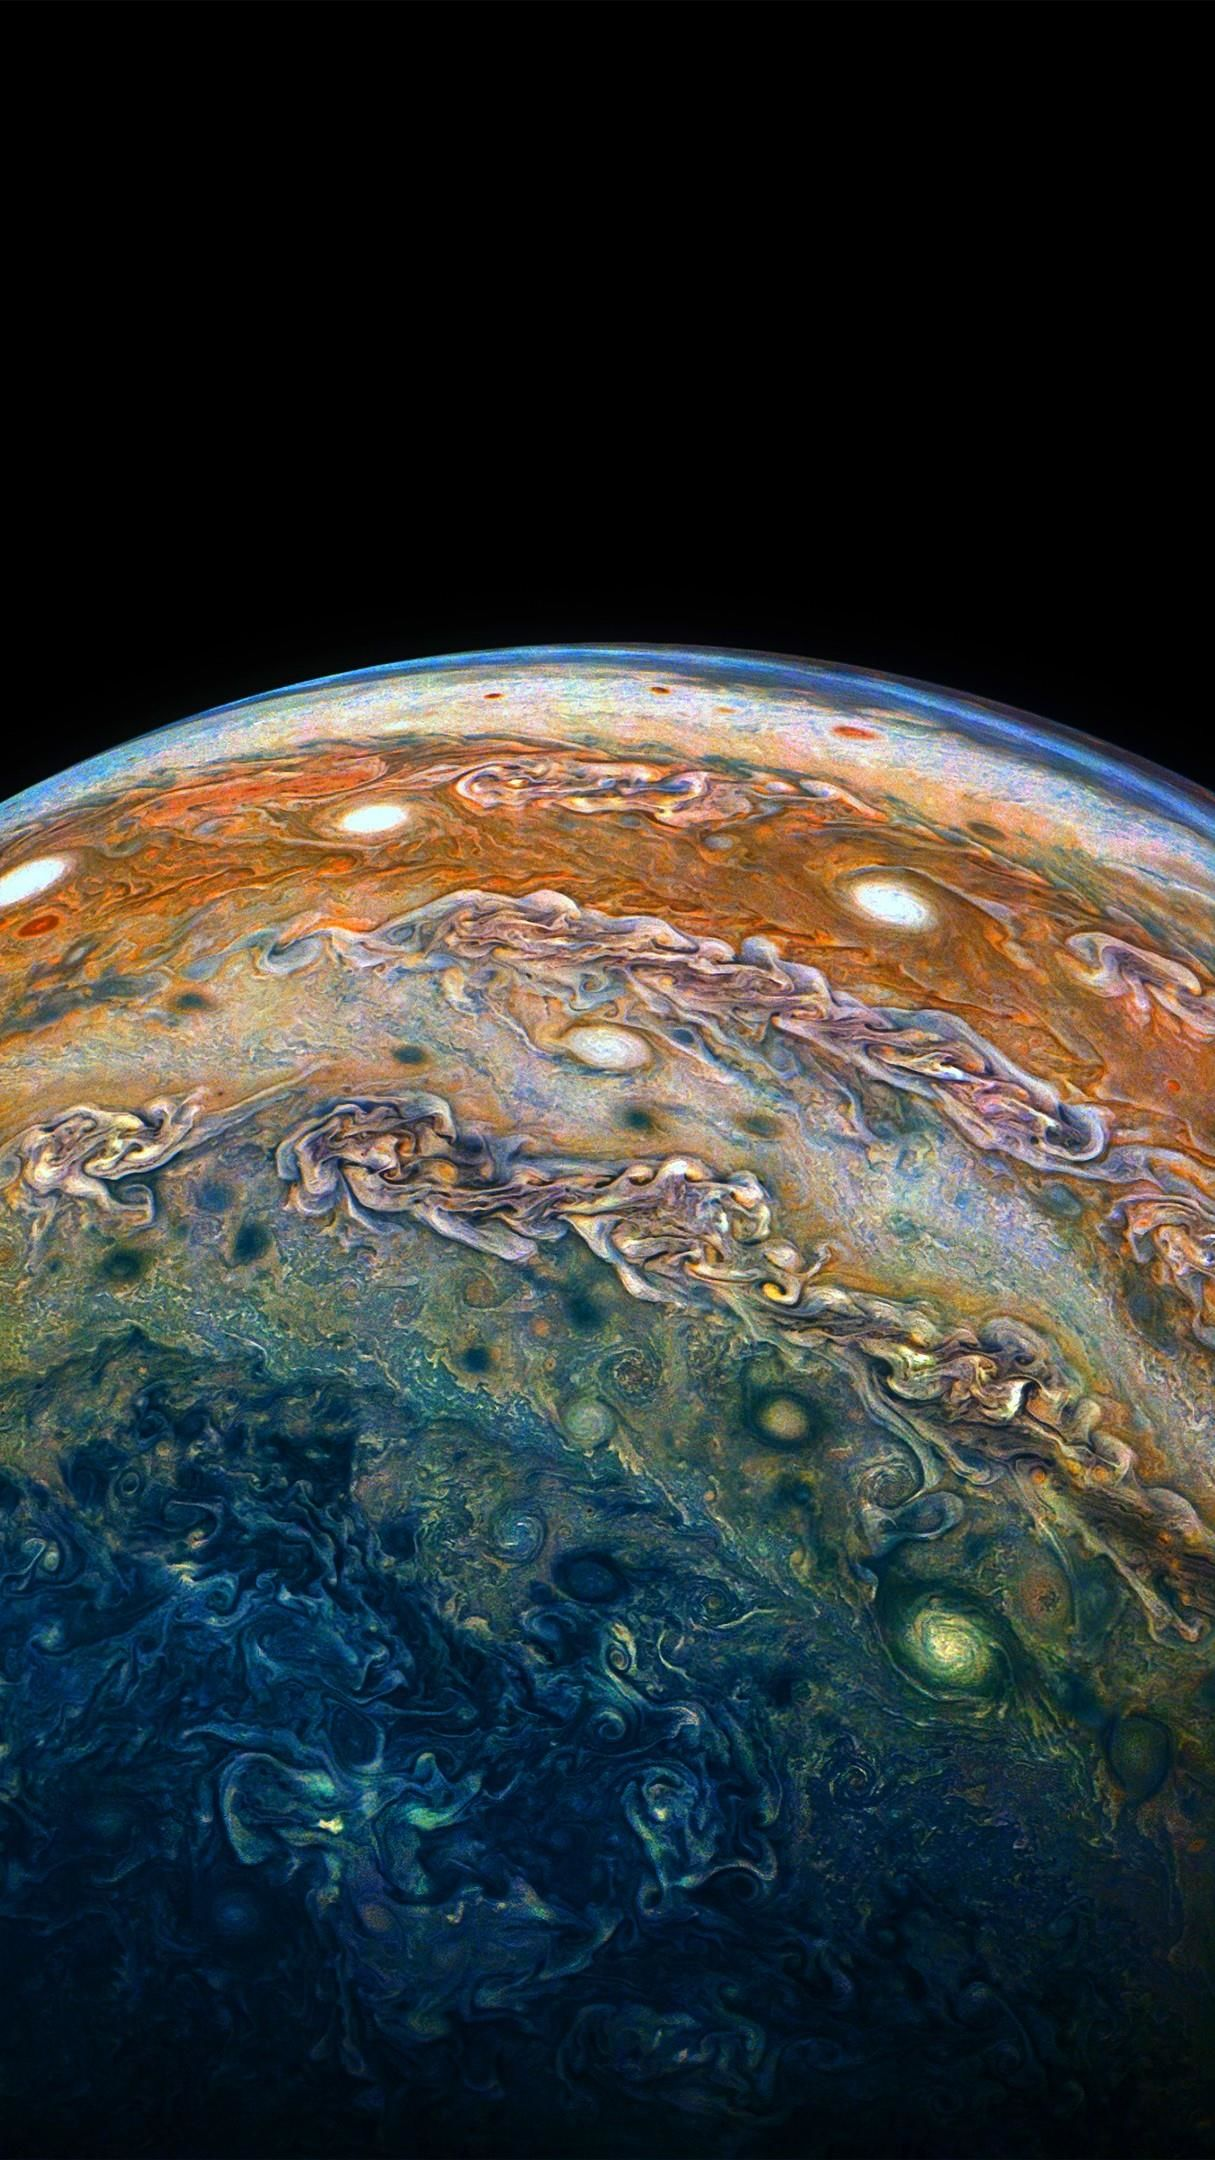 NASA Juno Mission 4K UltraHD Wallpaper